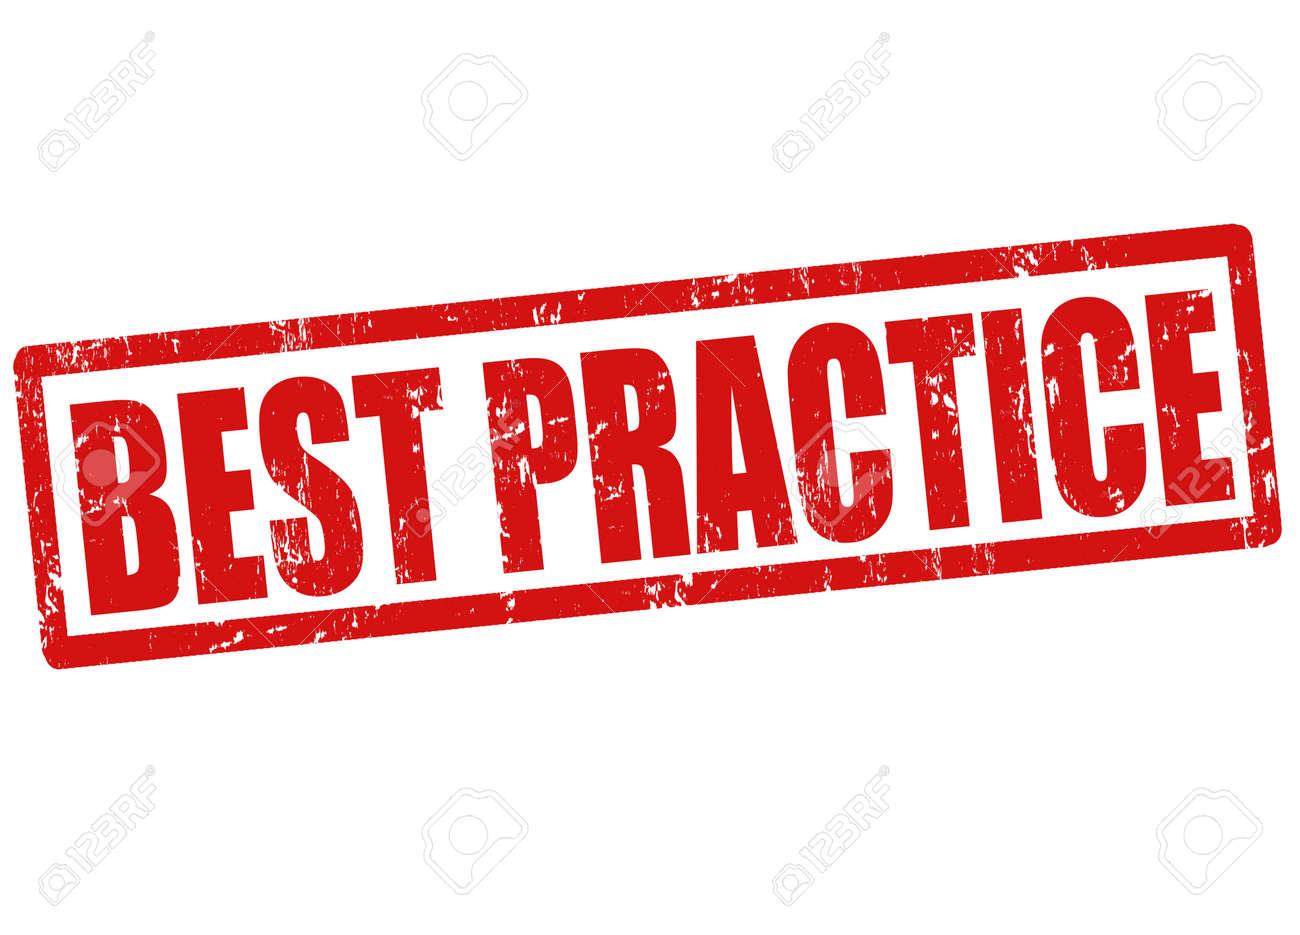 Best practice grunge rubber stamp on white, vector illustration Stock Vector - 23974619